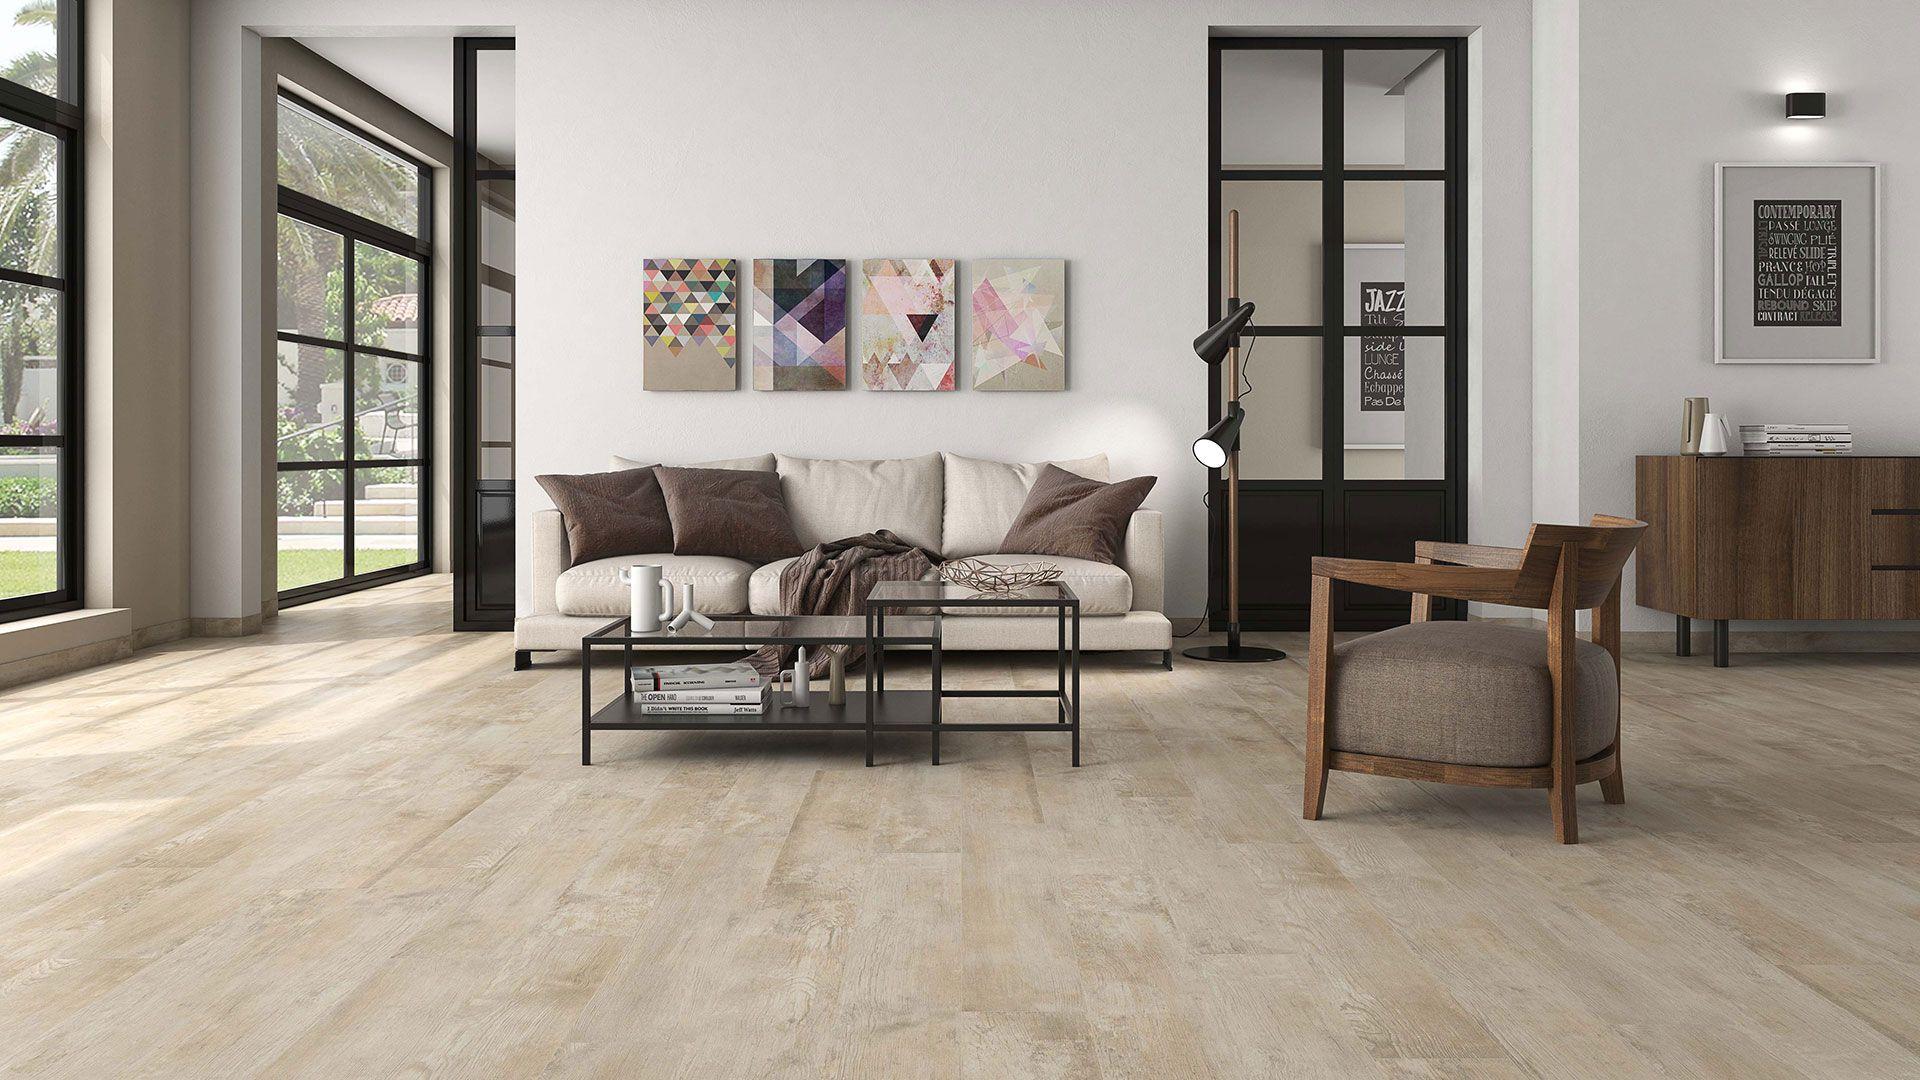 Driftwood Pearl Armatile Woodtiles Tile Floor Living